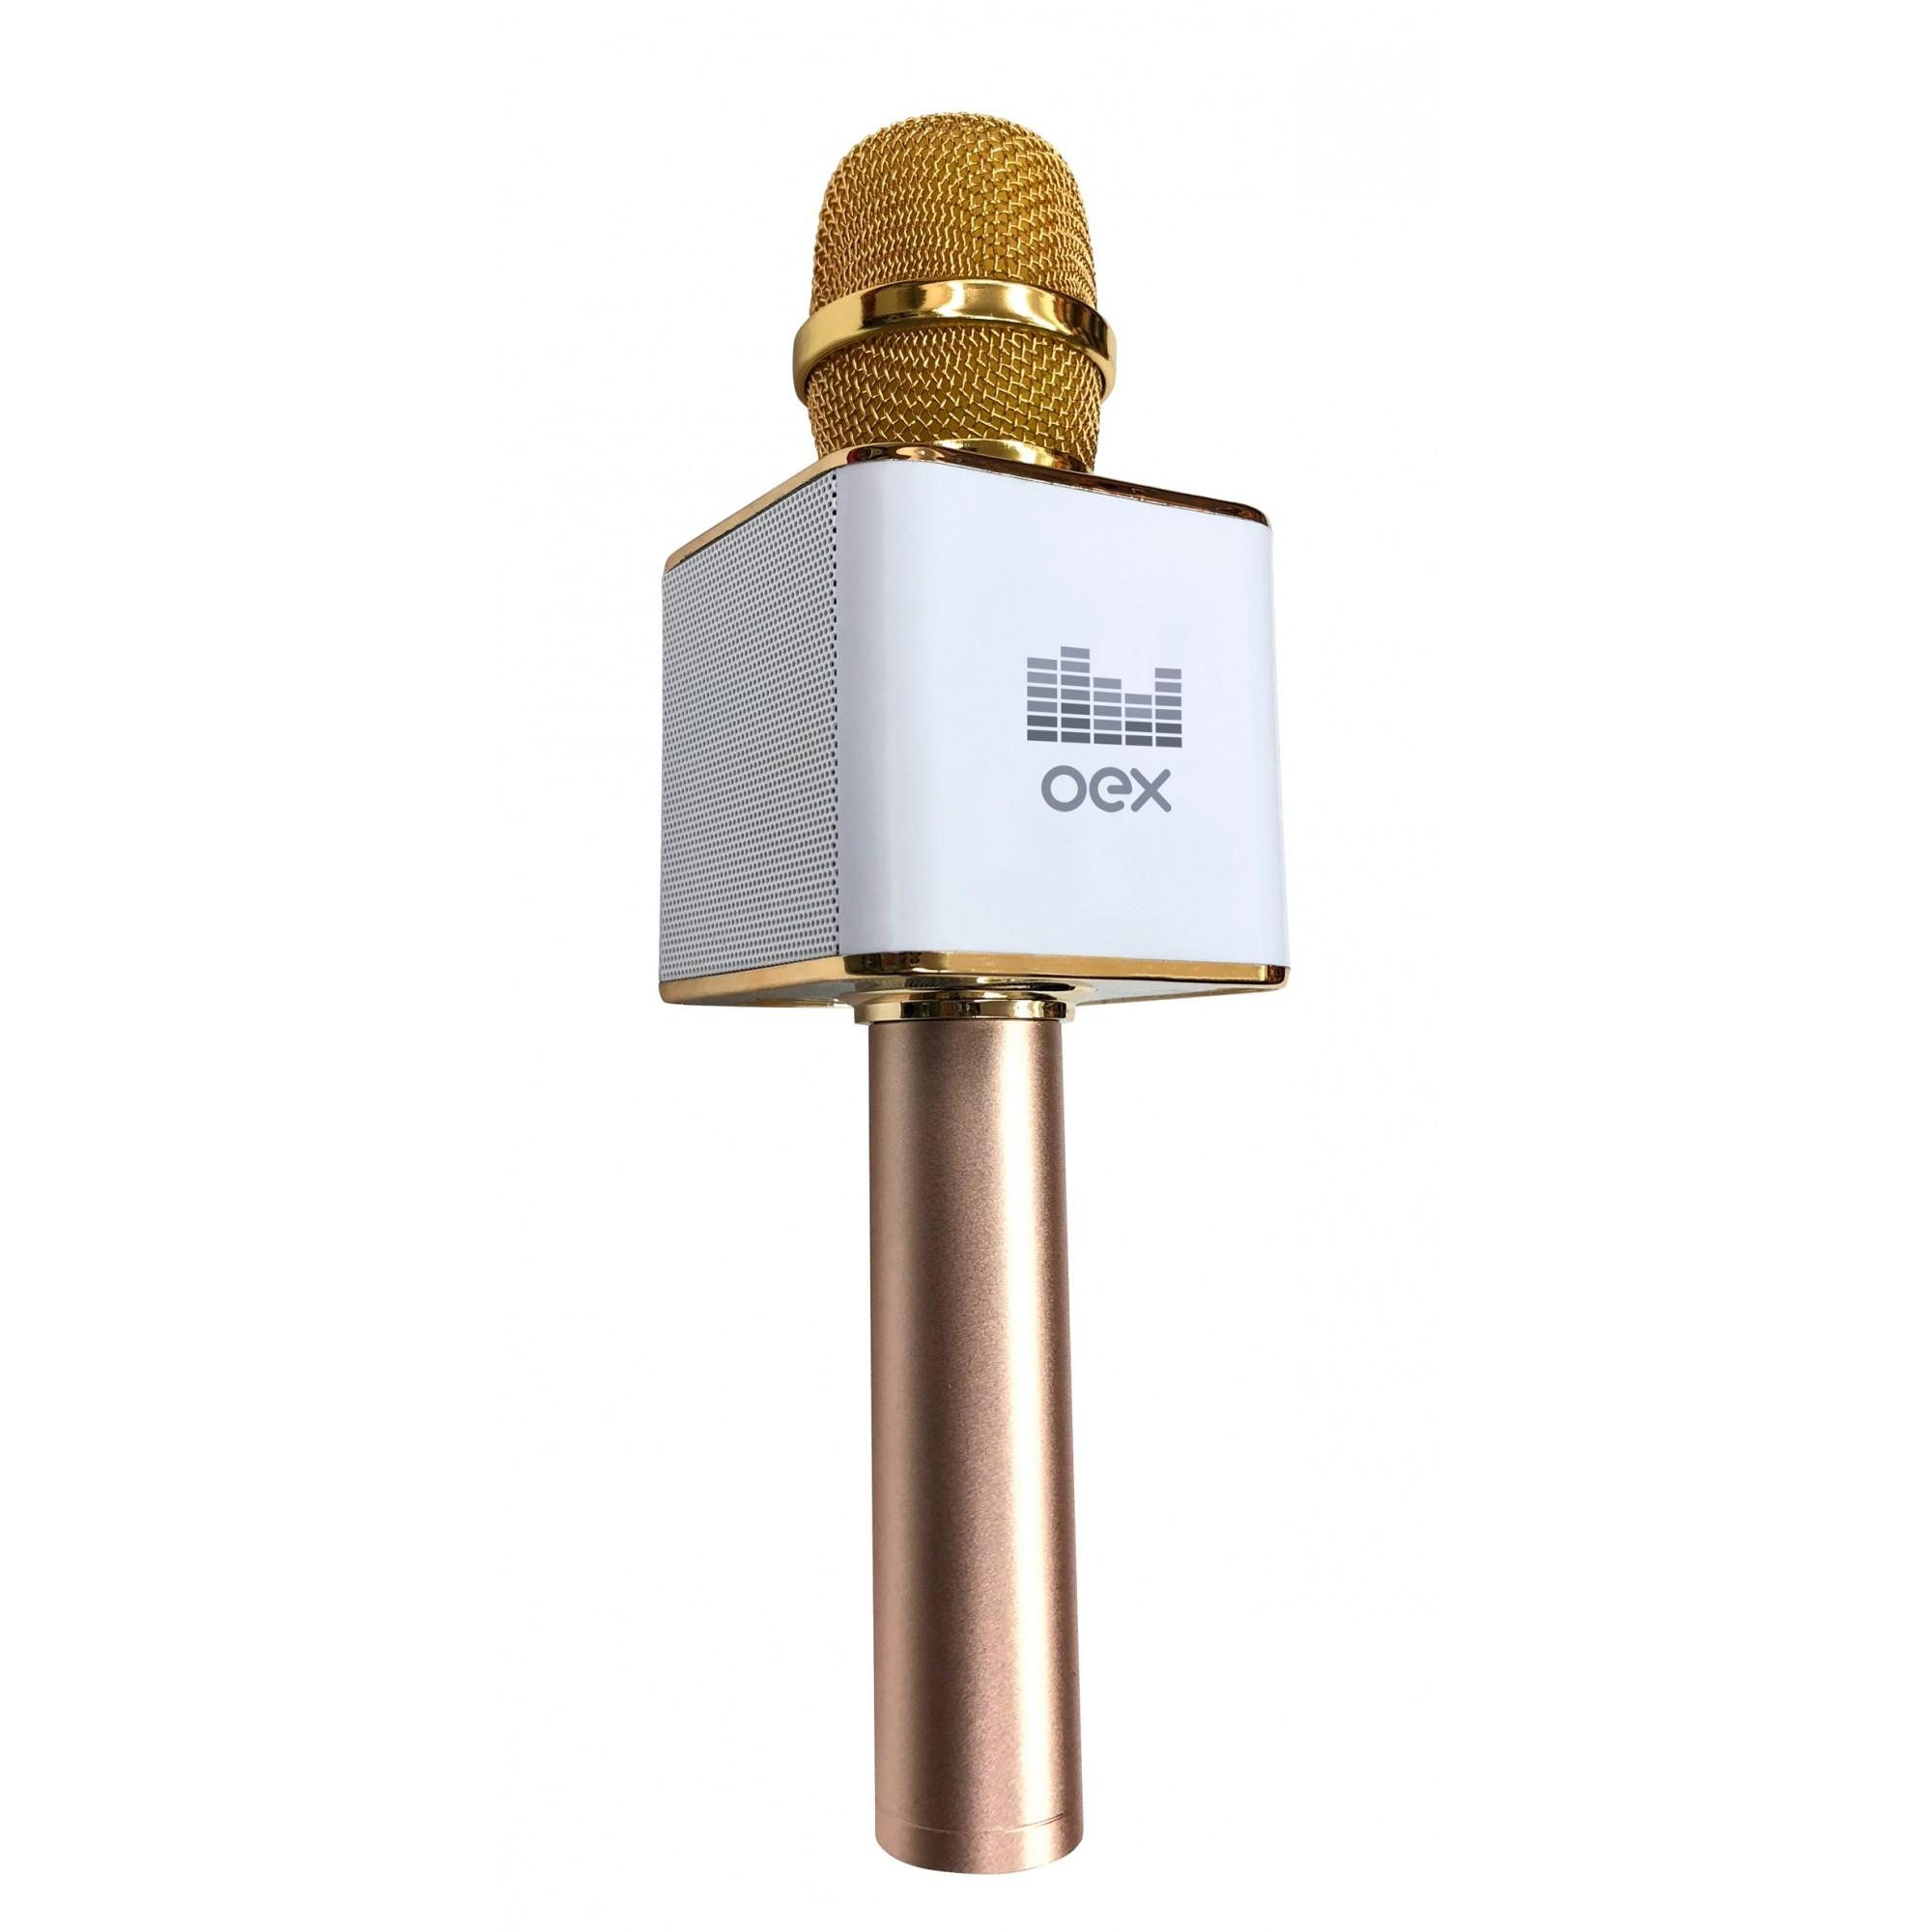 Microfone Karaoke Voice Bluetooth Dourado 6W MK100 Oex